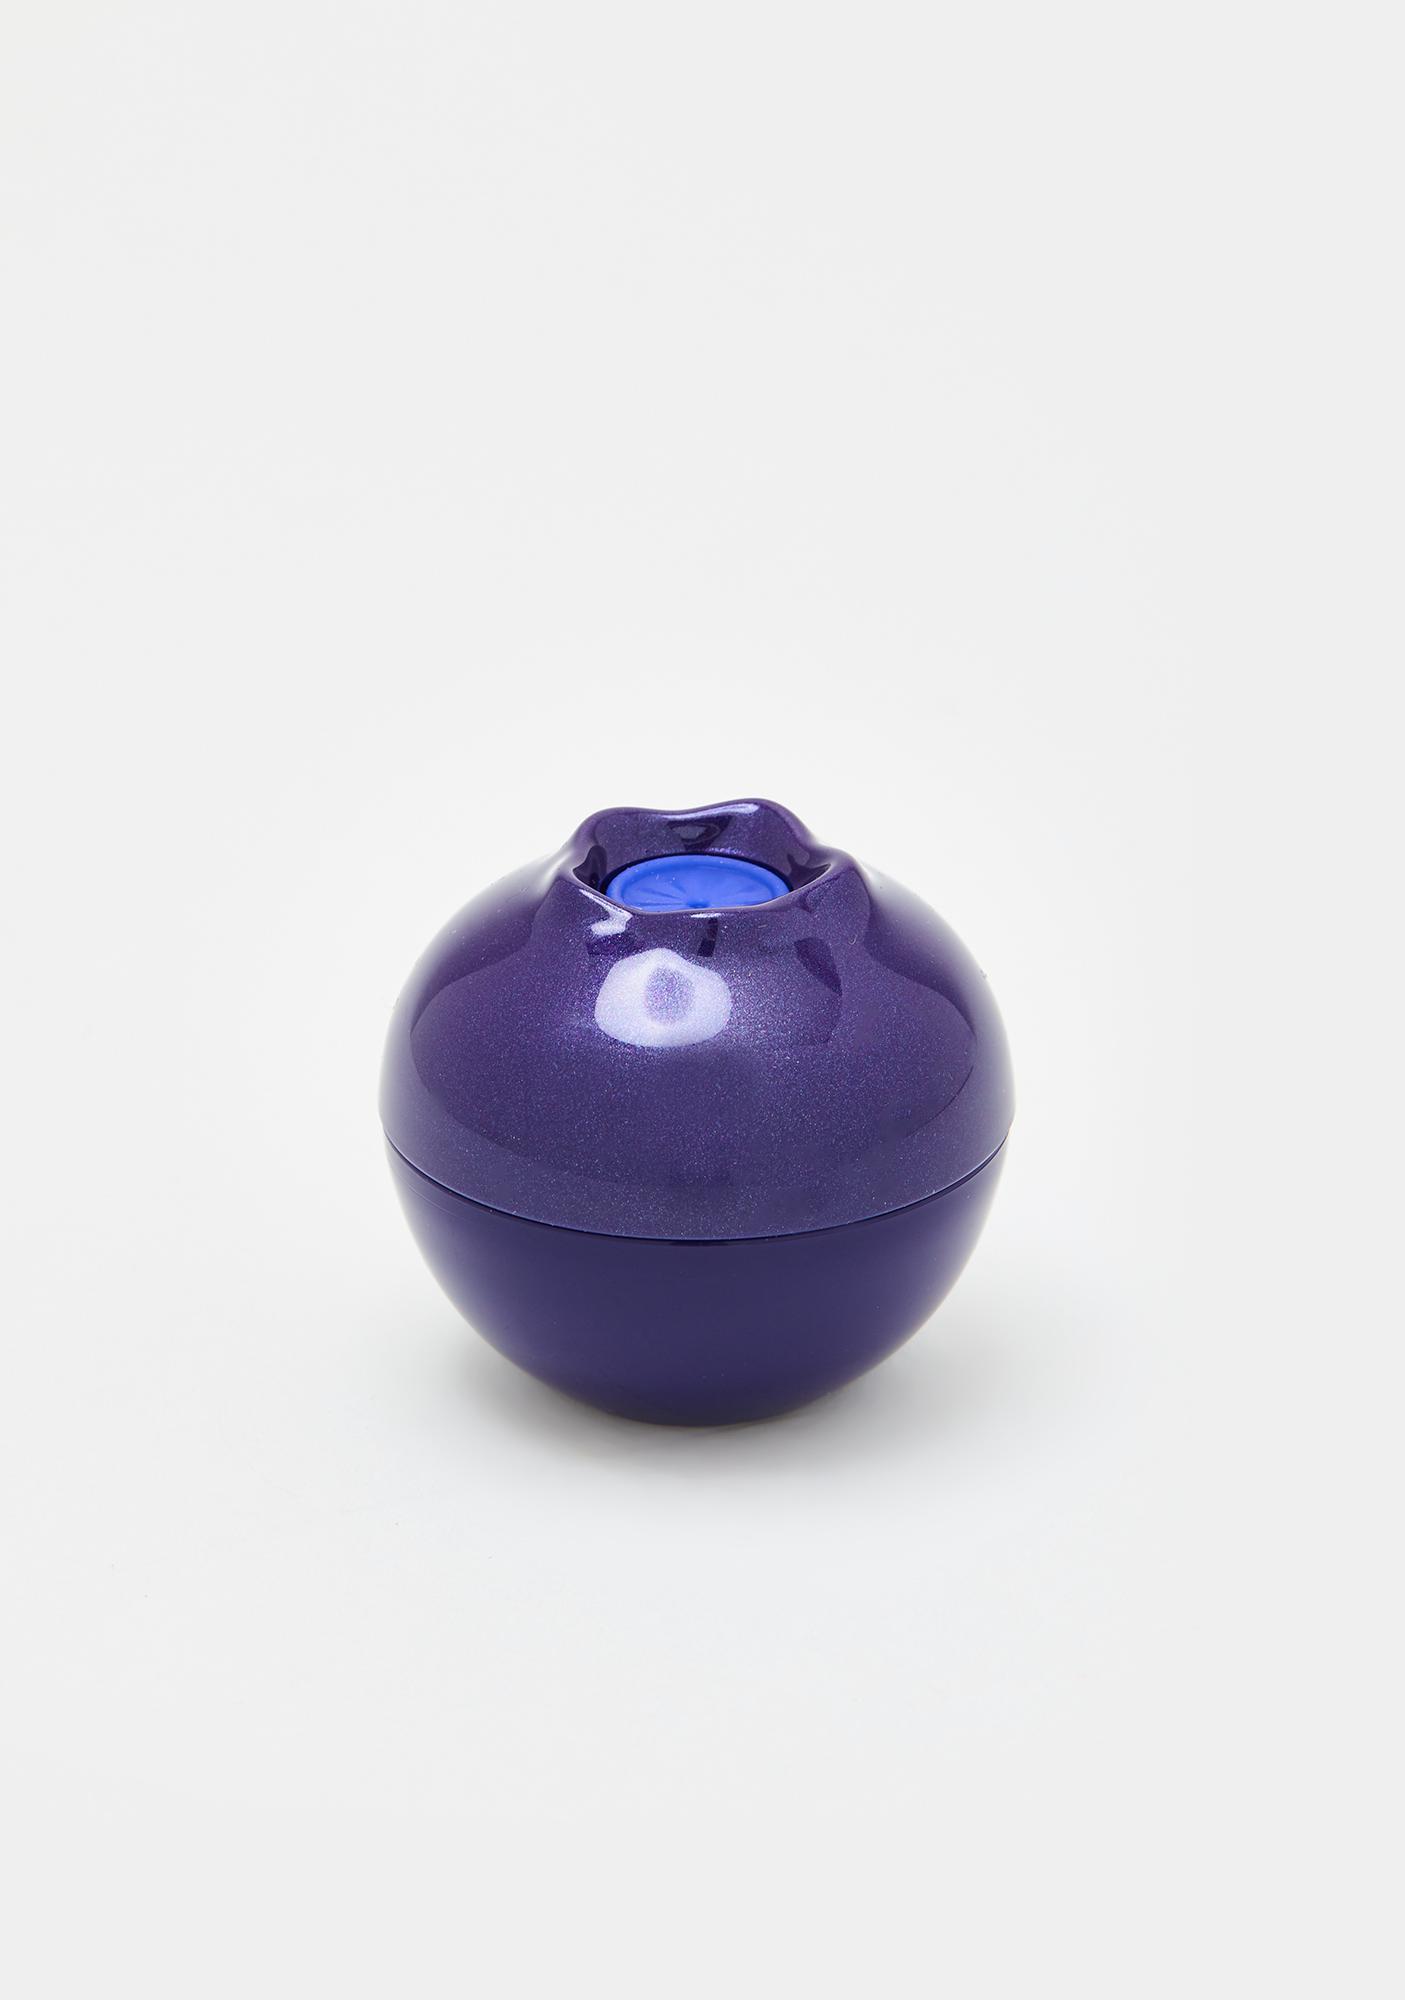 TONYMOLY Blueberry Mini Fruit Lip Balm